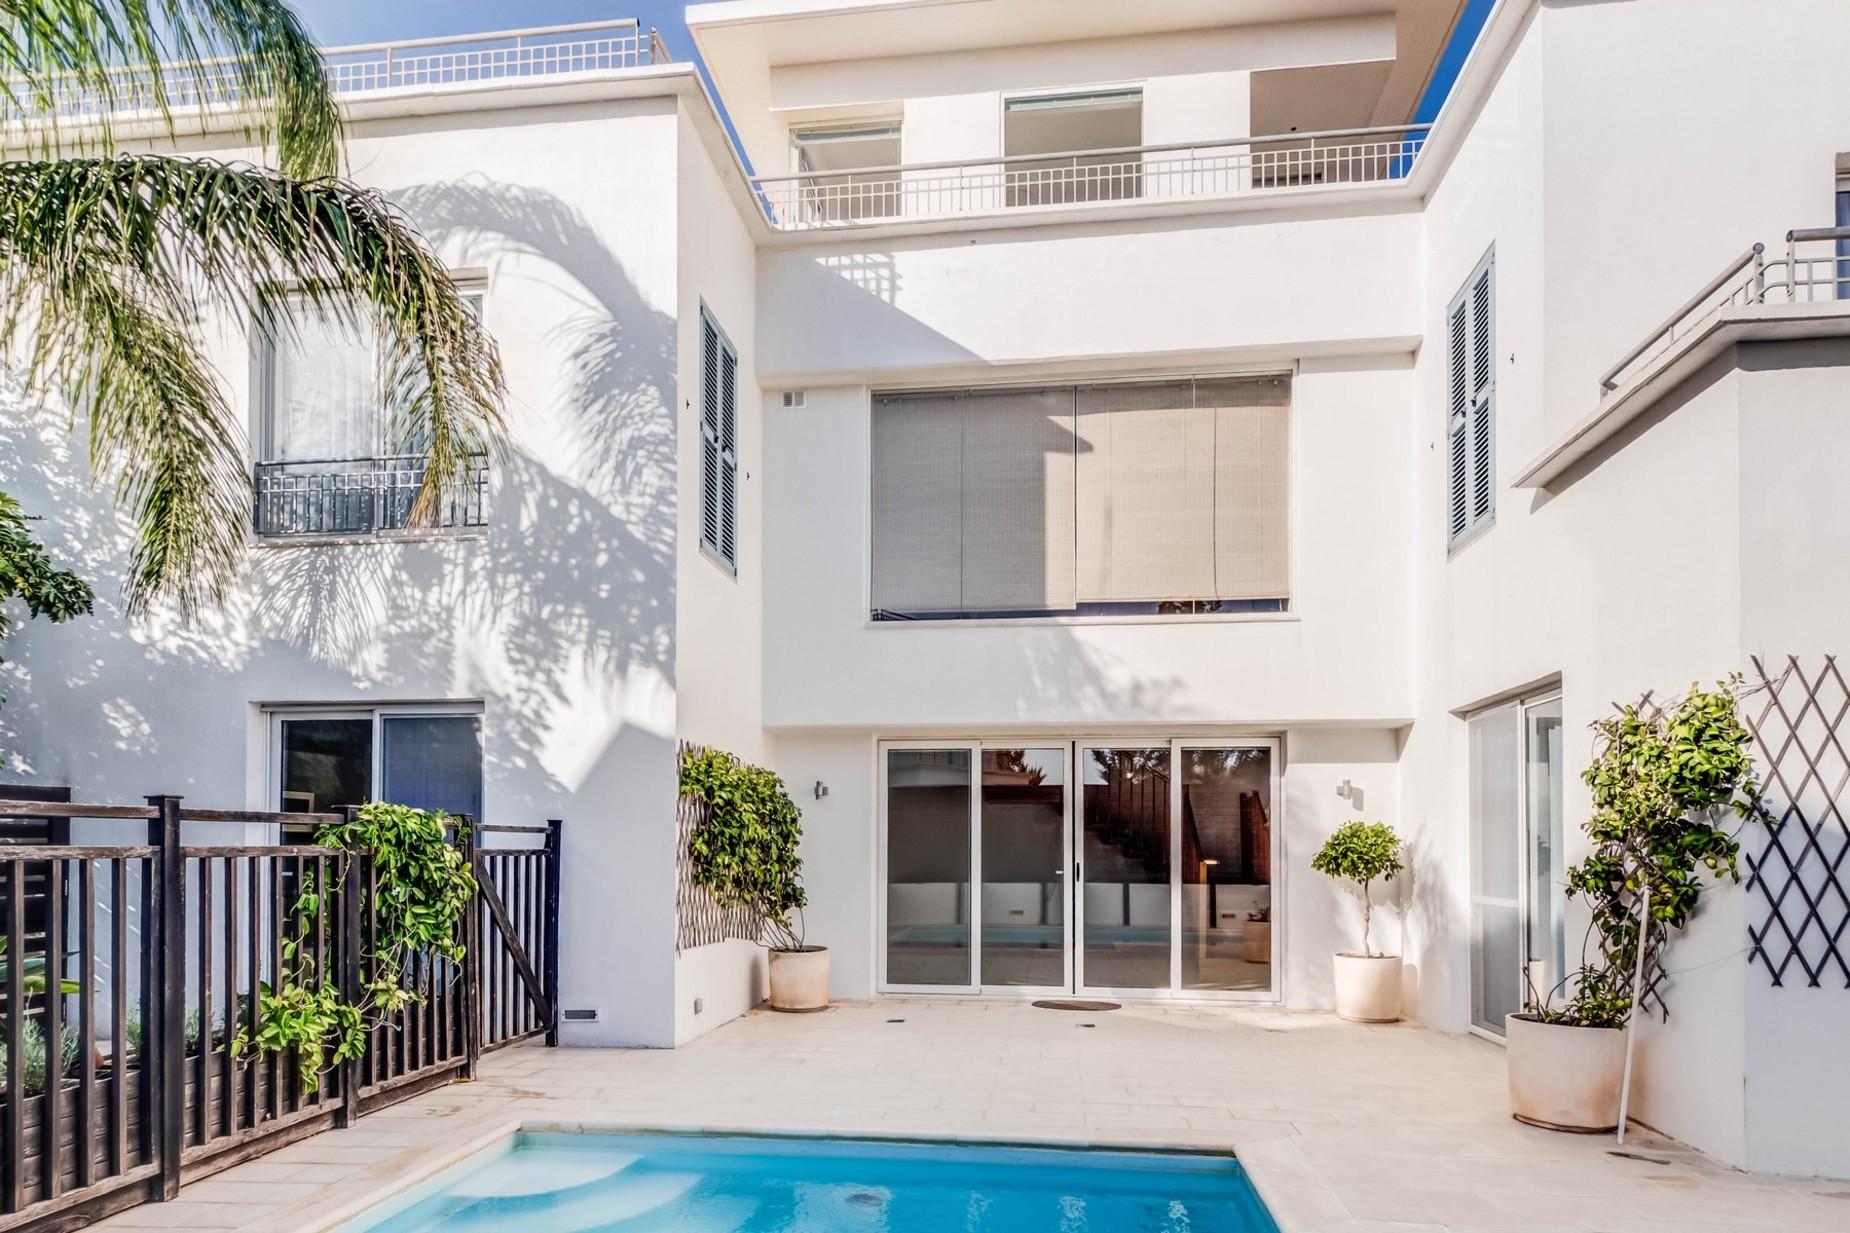 4 bed Villa For Rent in Naxxar, Naxxar - thumb 2